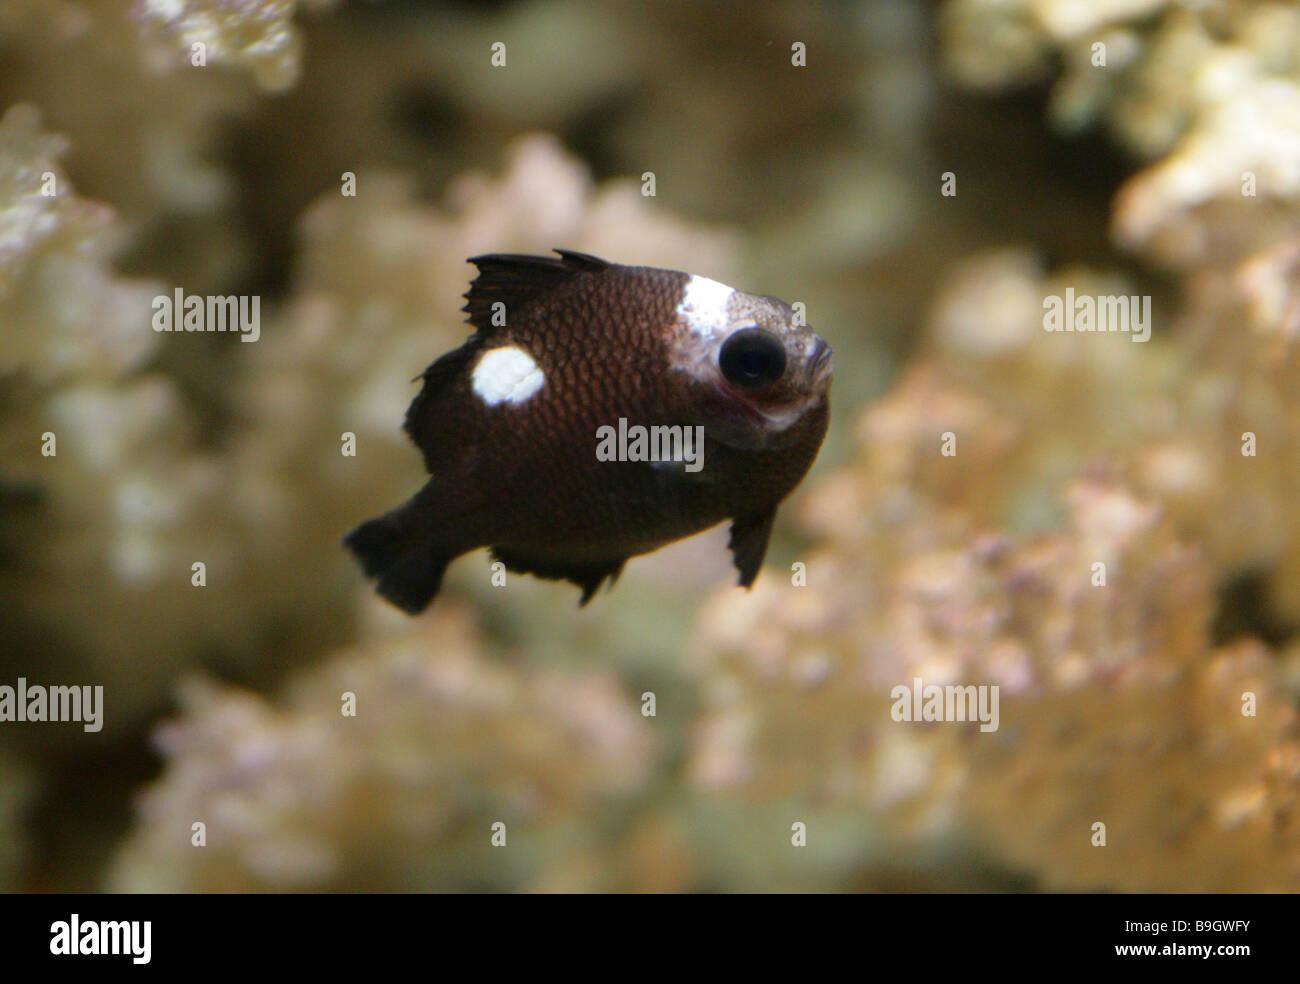 Threespot Dascyllus aka the Domino Damsel or Simply Domino, Dascyllus trimaculatus, Pomacentridae. An Indo Pacific - Stock Image